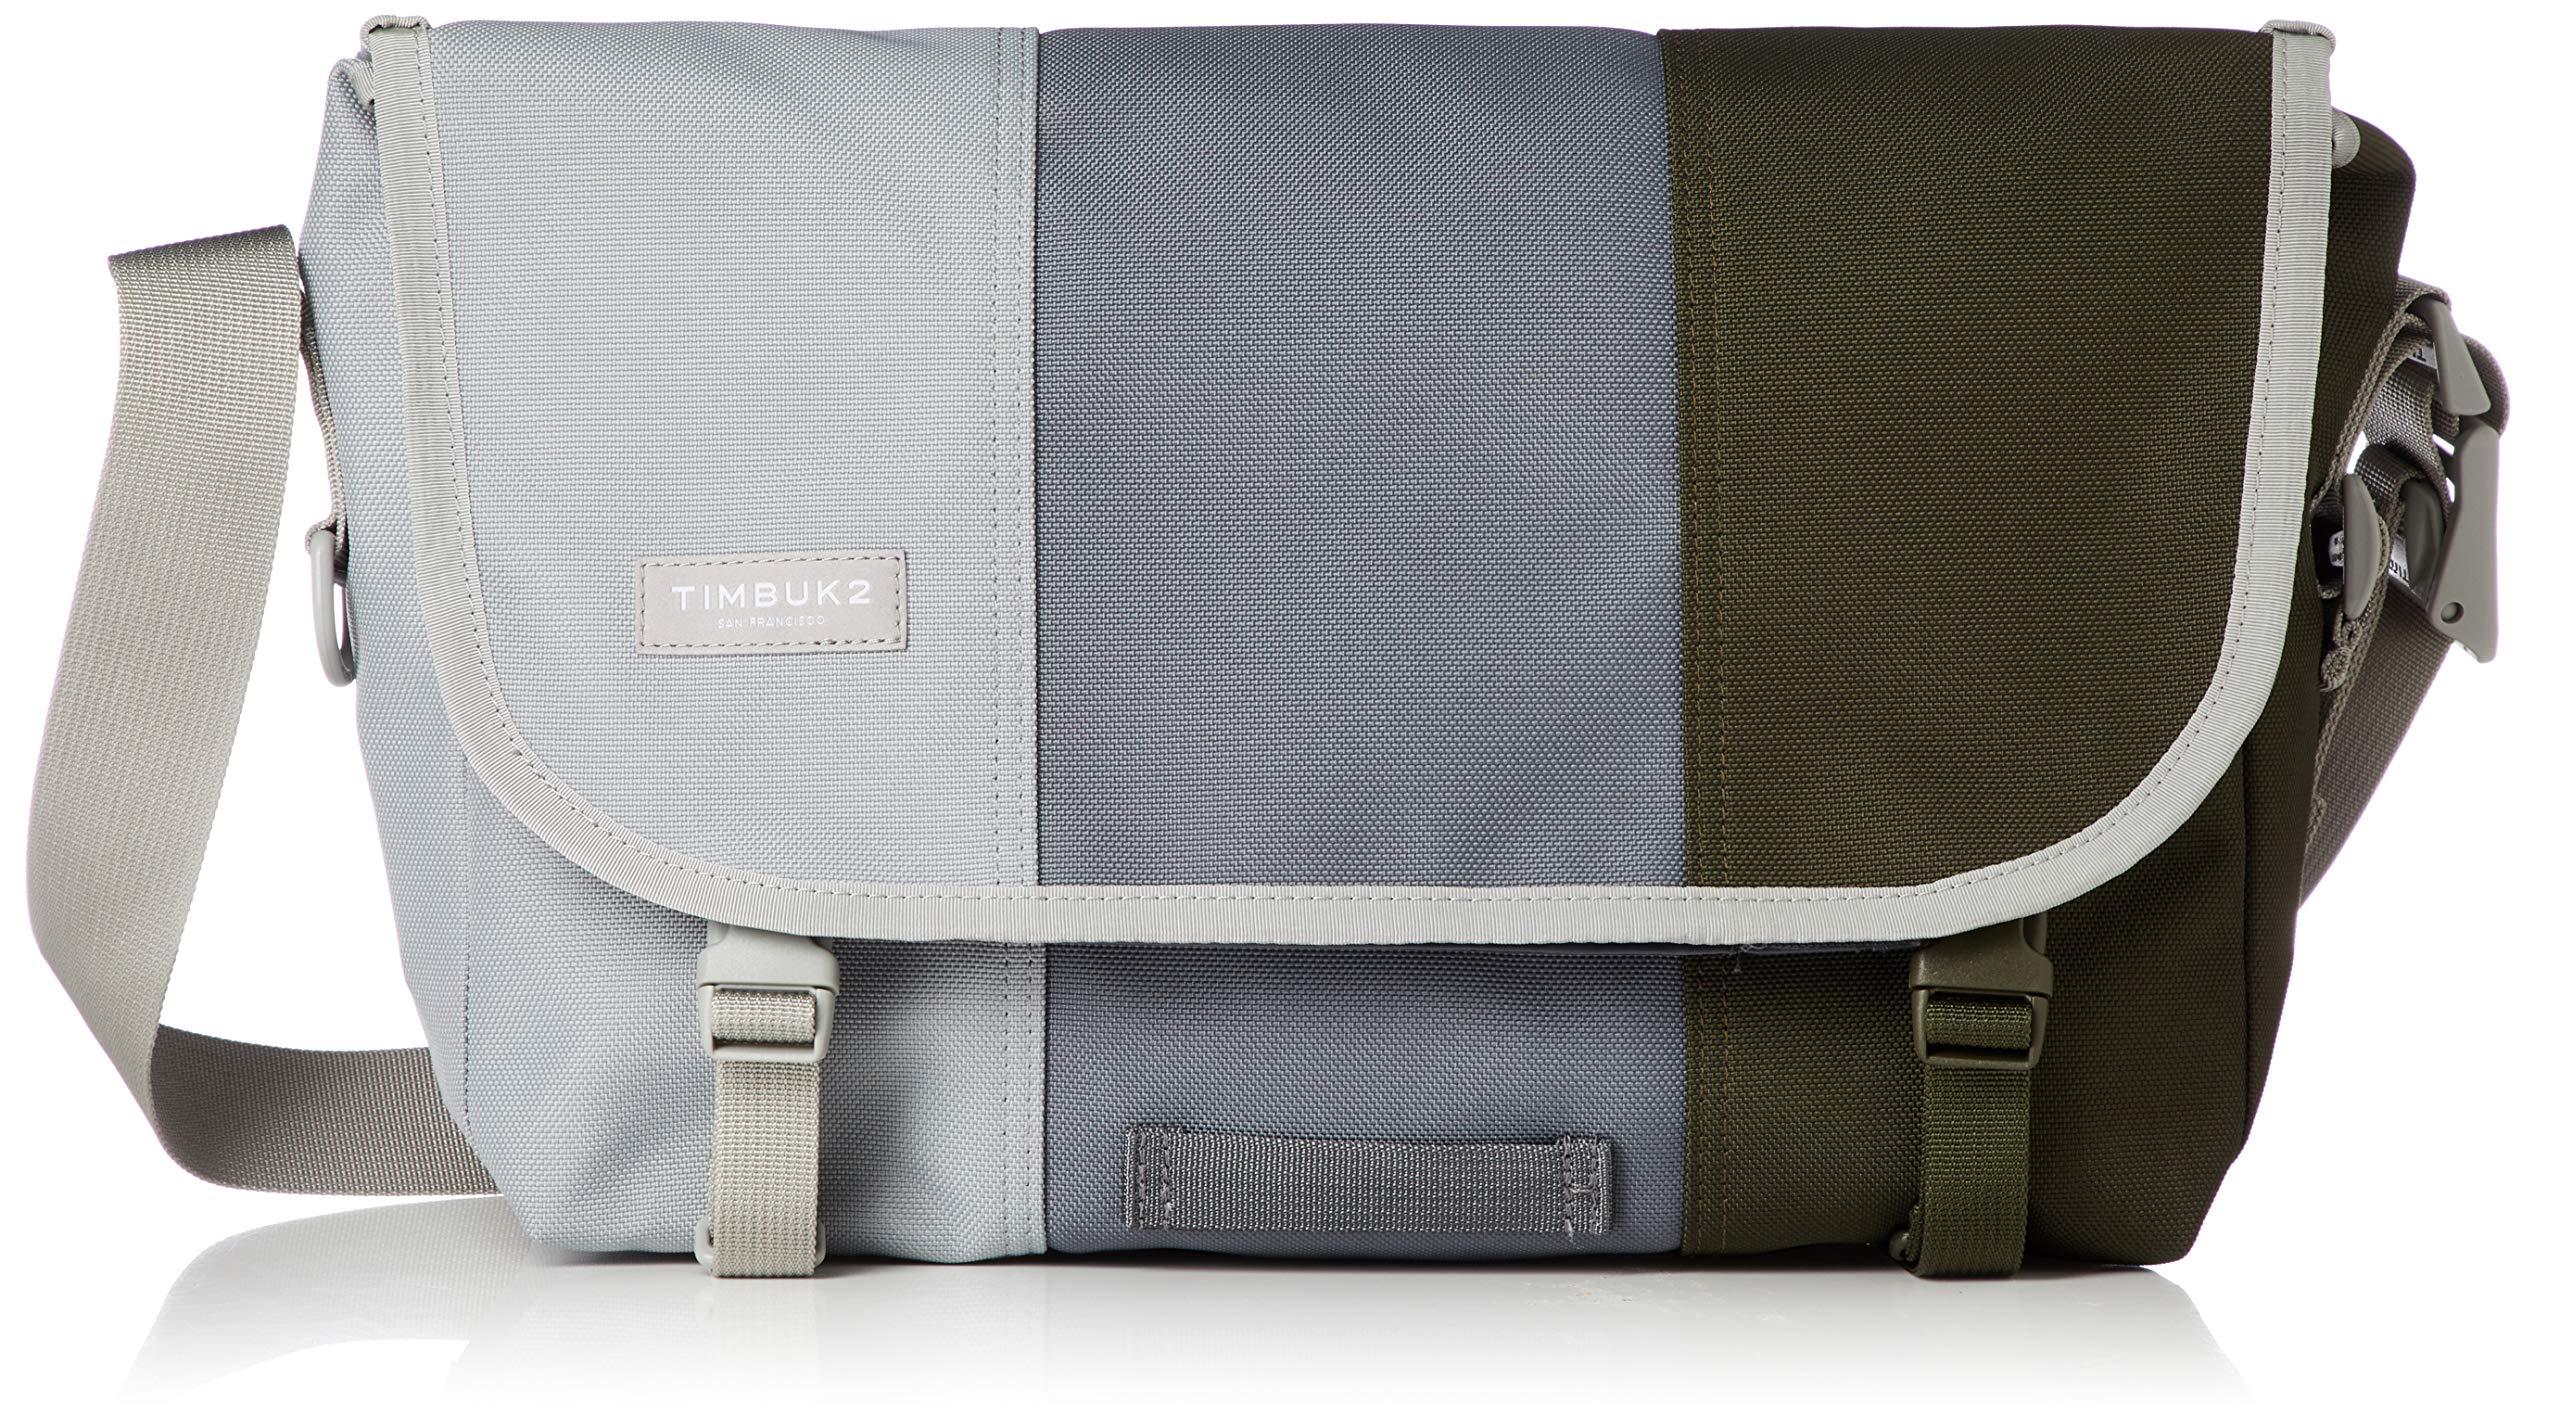 Timbuk2 Classic Tres Colores Messenger Bag, Cinder, Medium by Timbuk2